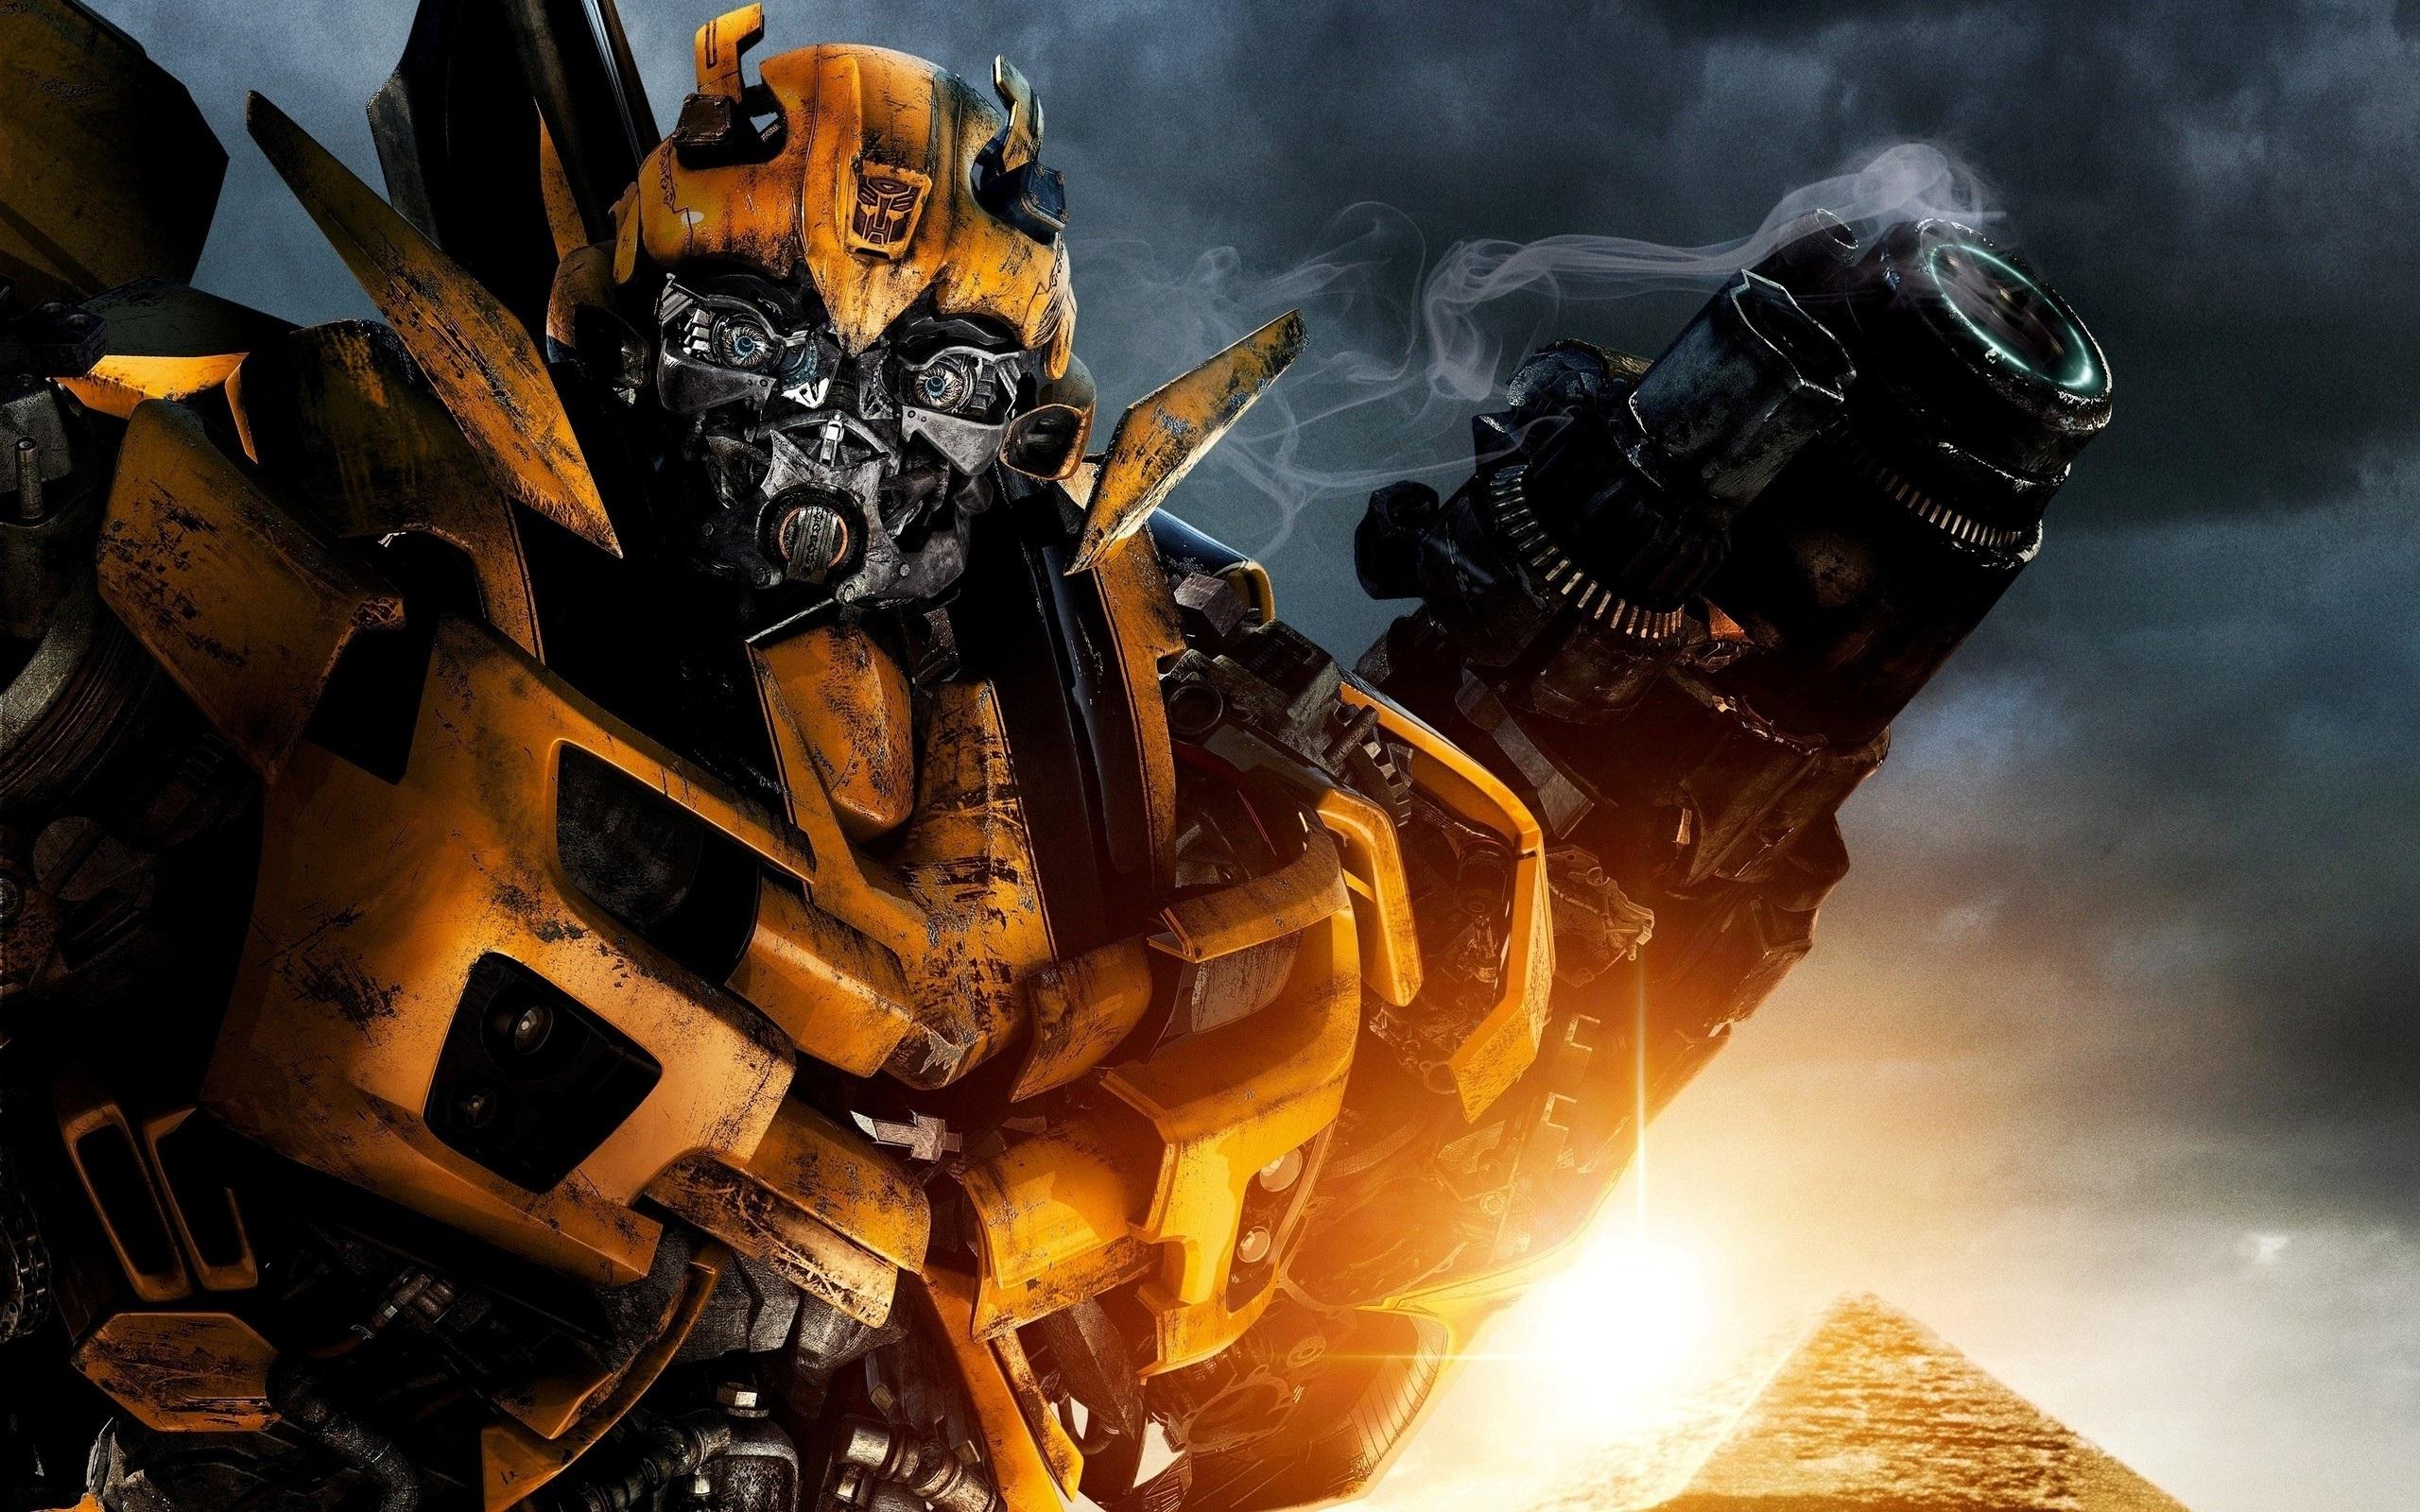 Best Transformers Quotes Bumblebee  Quotesgram